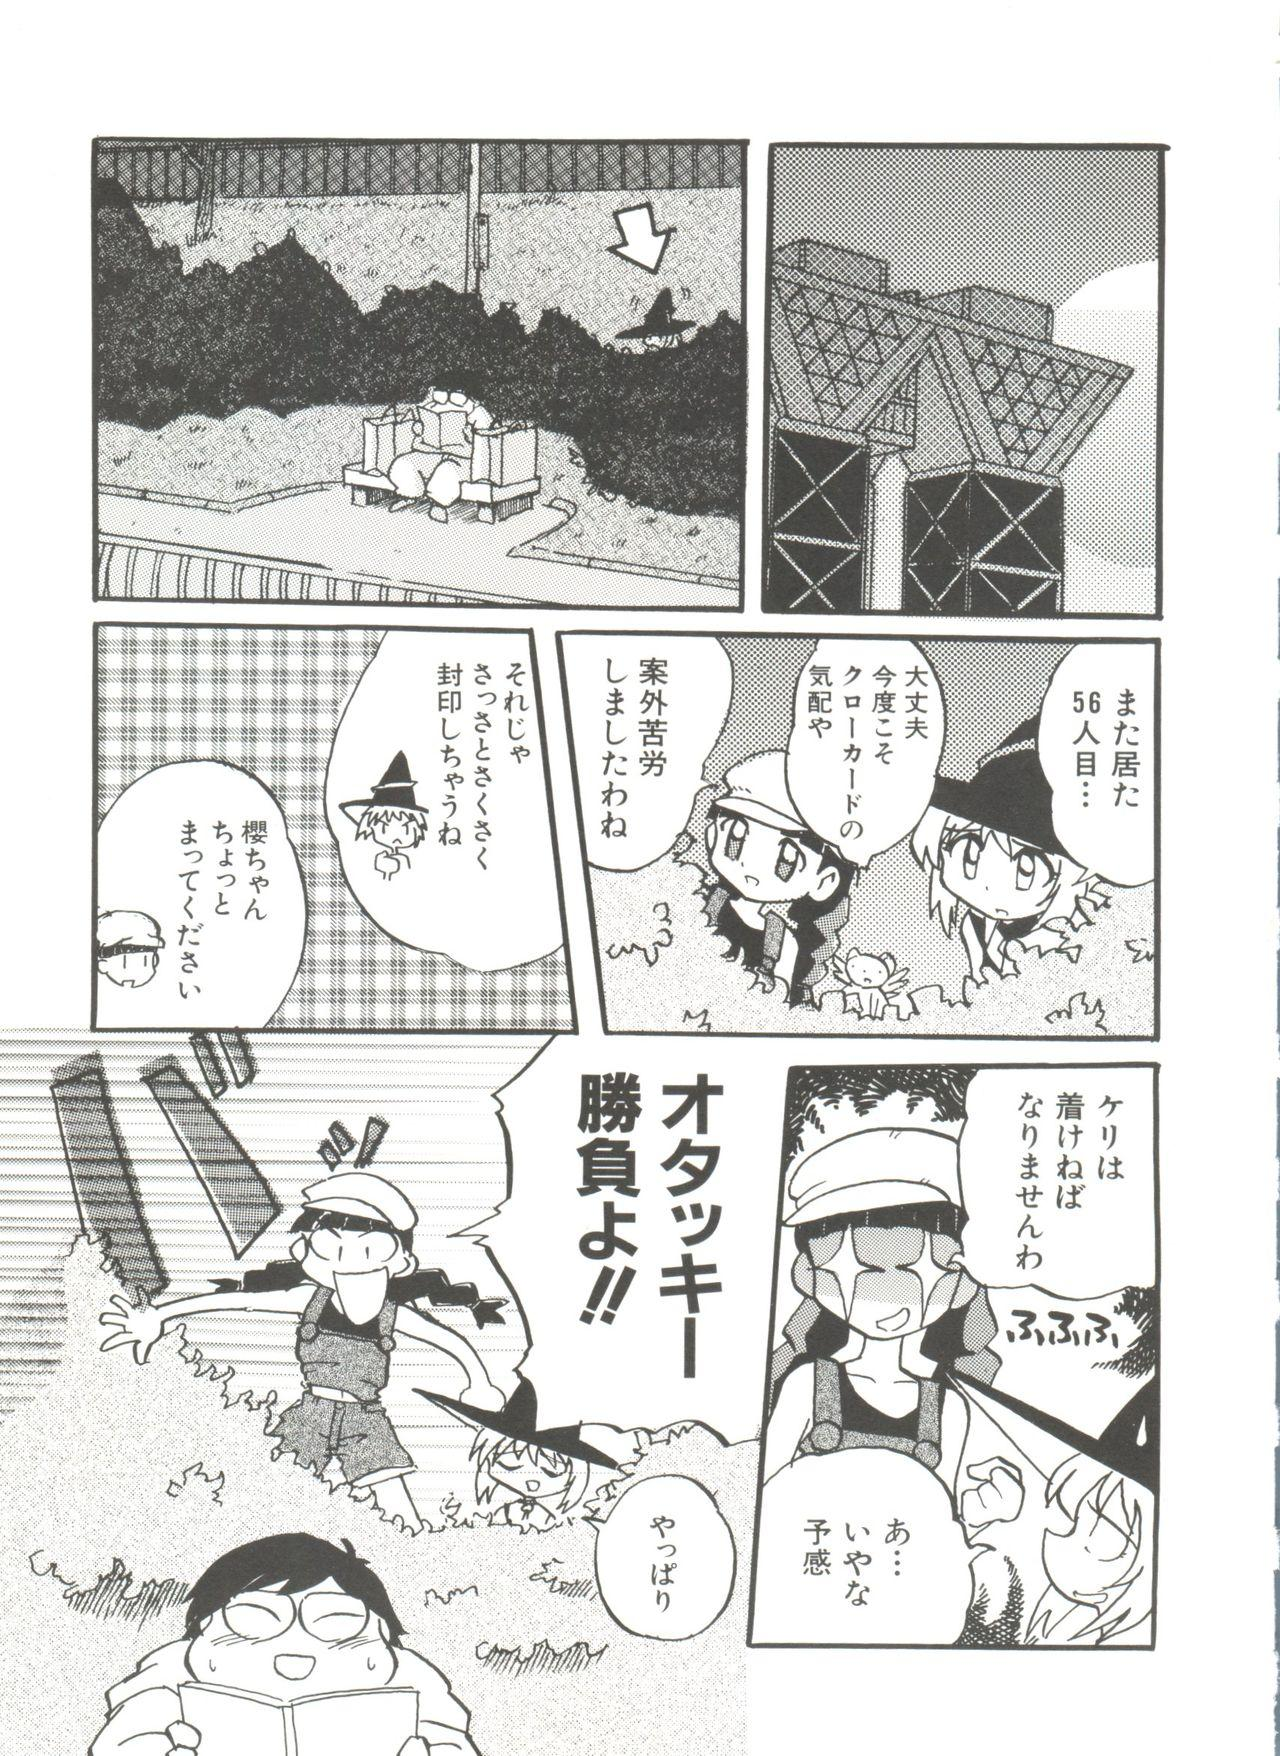 [Anthology] Denei Tamatebako 8 - Utakata no Tenshi-tachi II (Various) 122